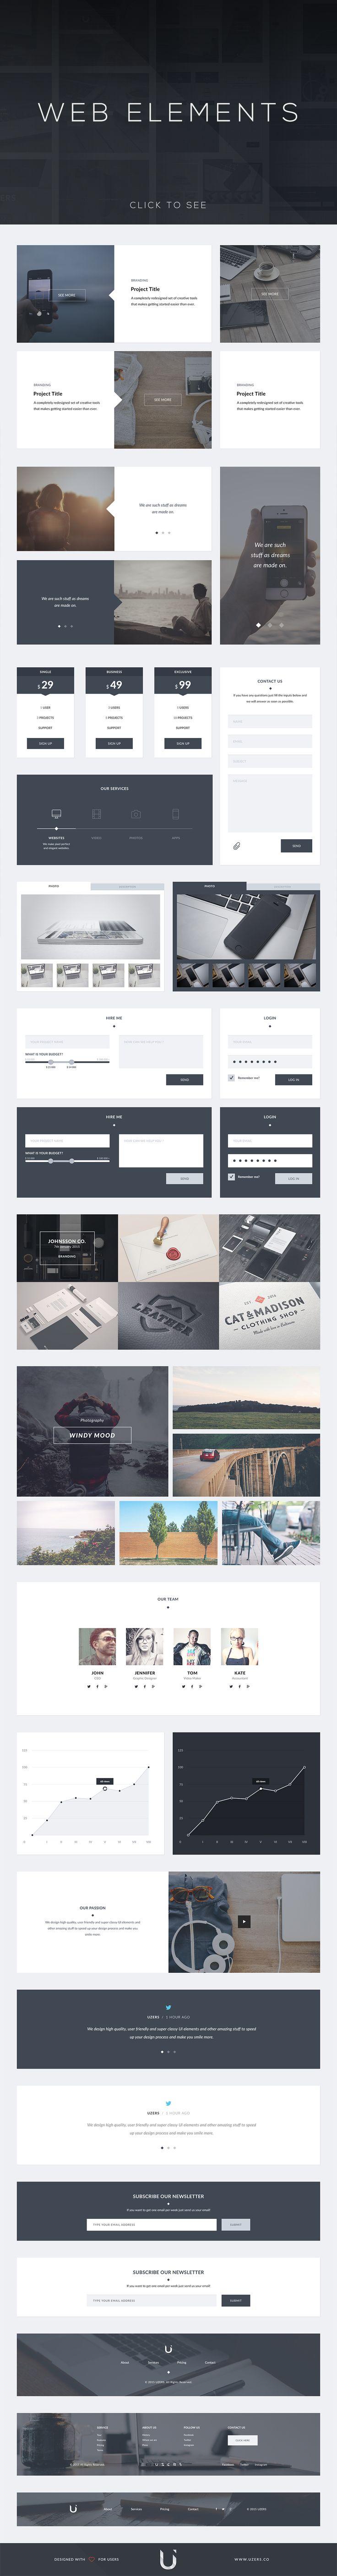 Uzers UI Kit - Web Elements - 3